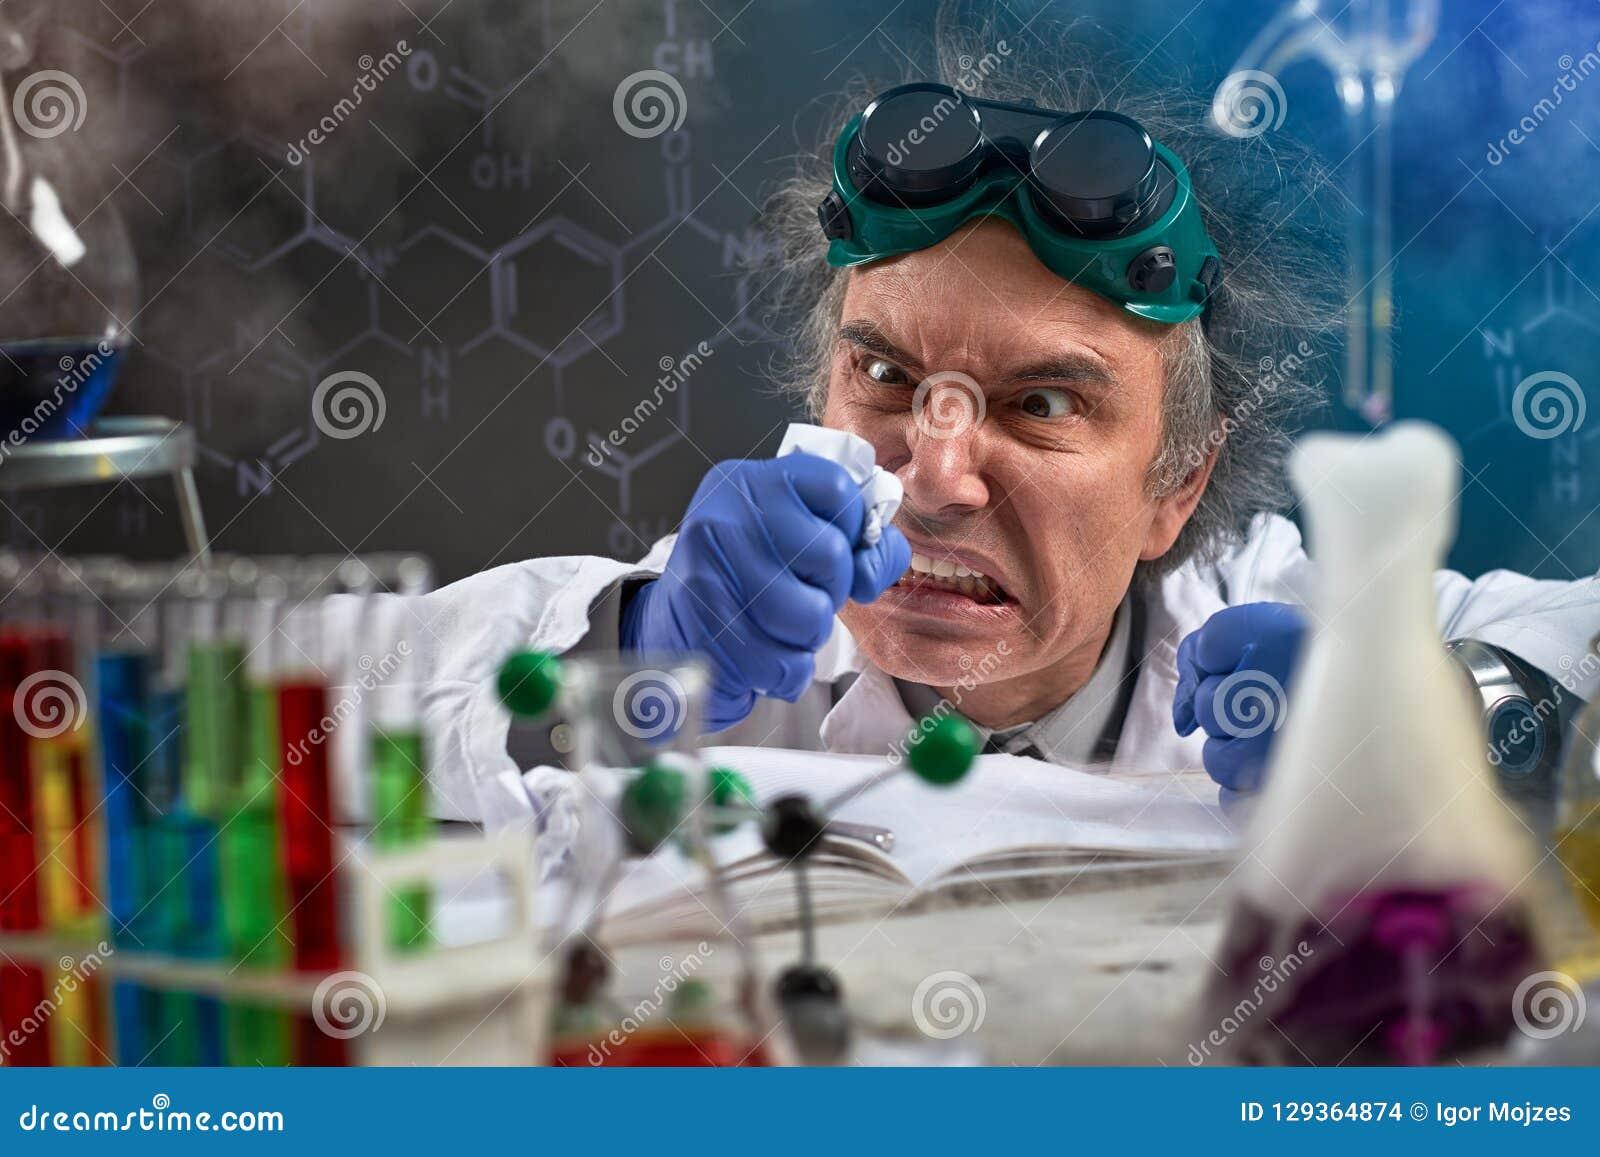 Den ilskna kemisten wreak deras missnöje på papper